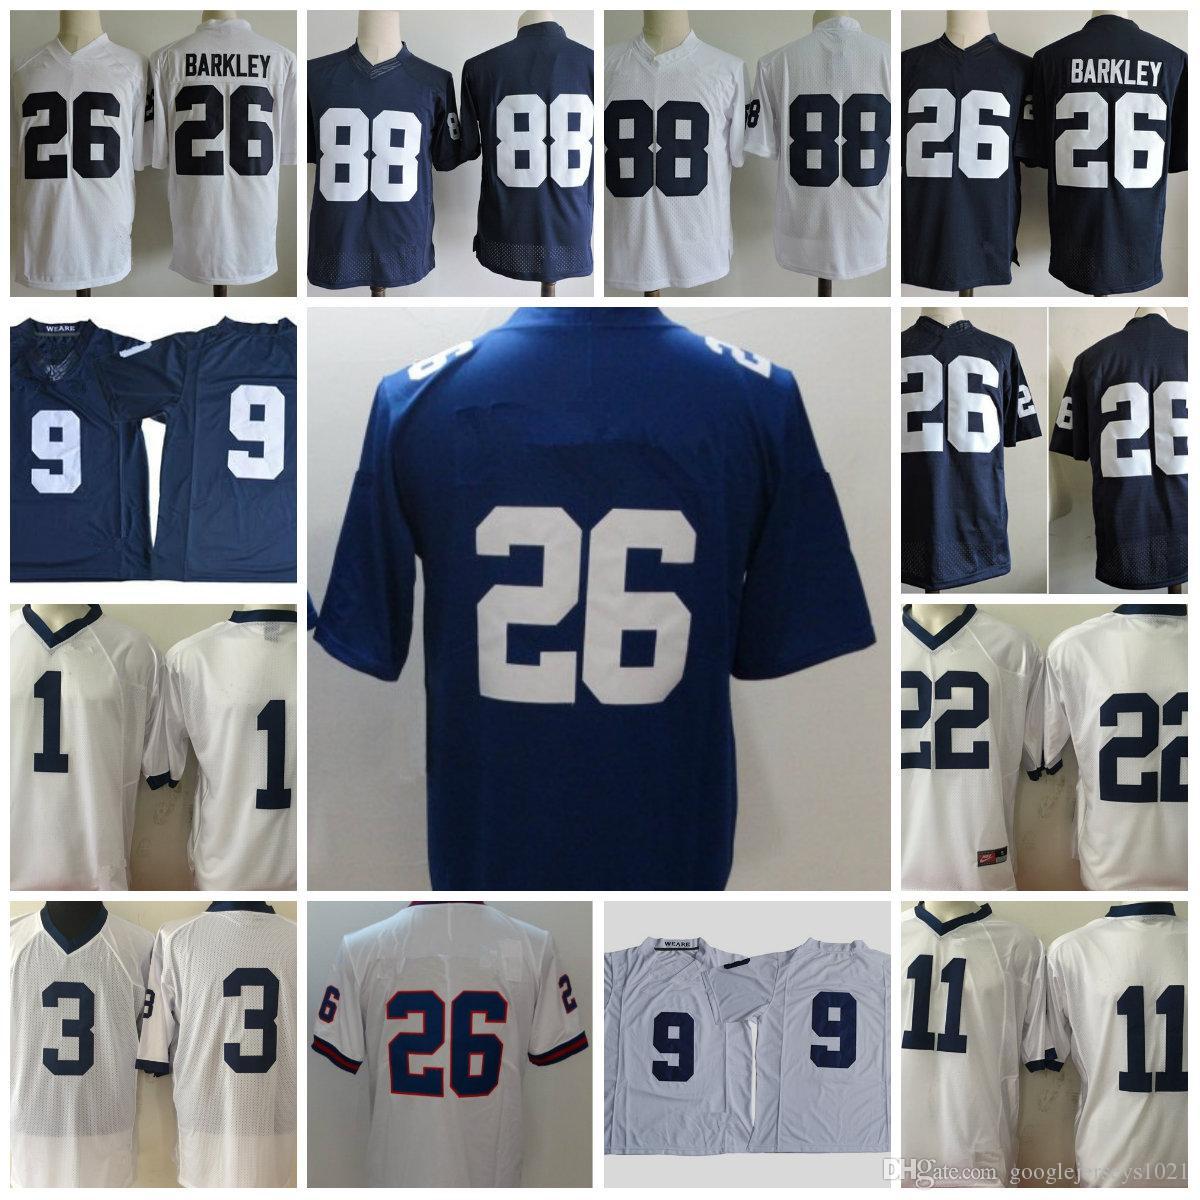 22f854be5 2018 Football NCAA Penn State Nittany Lions 26 Saquon Barkley 3 ...